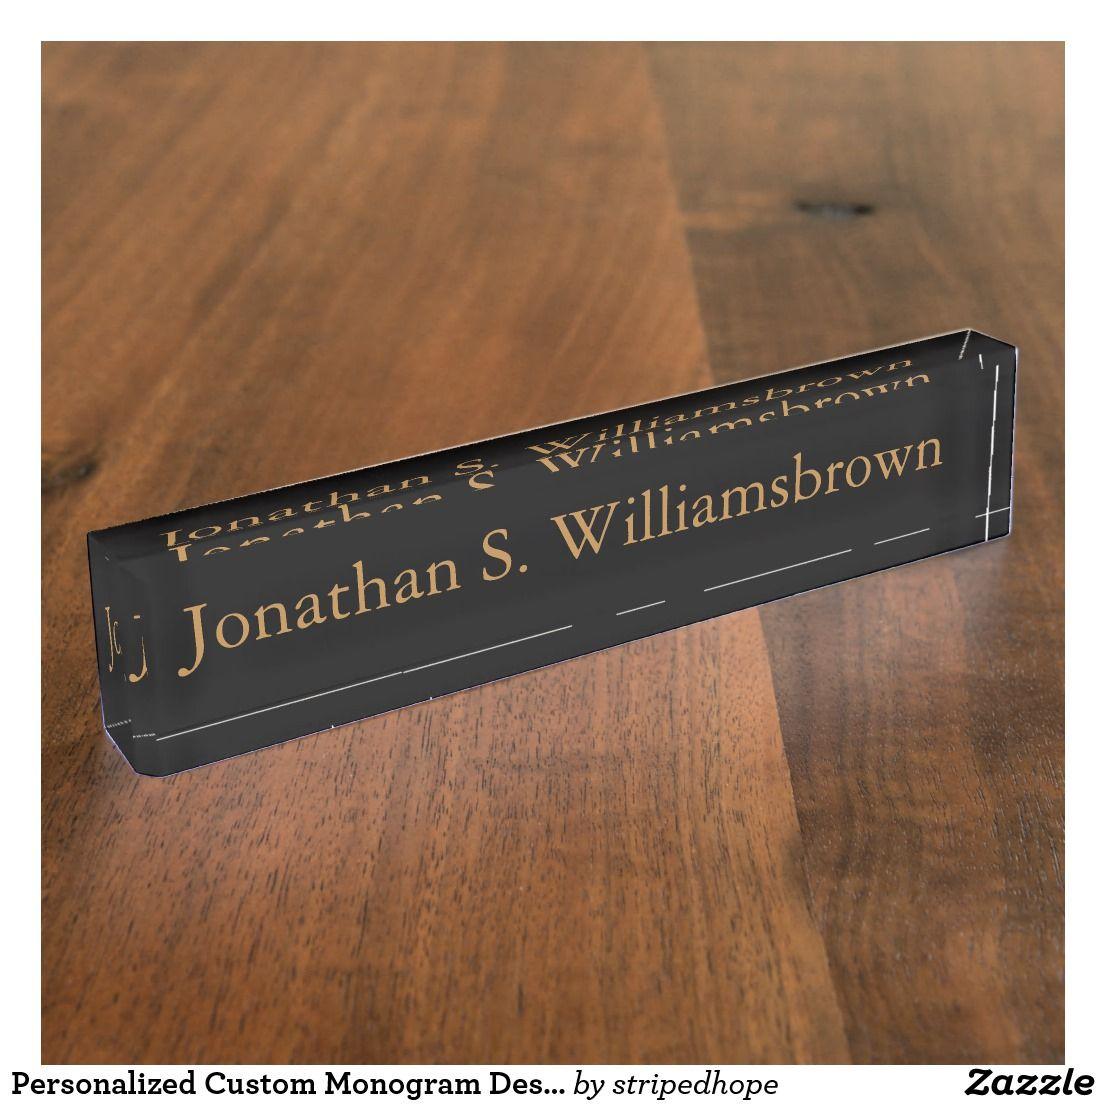 personalized custom monogram desk name plate zazzle com in 2019 rh pinterest com